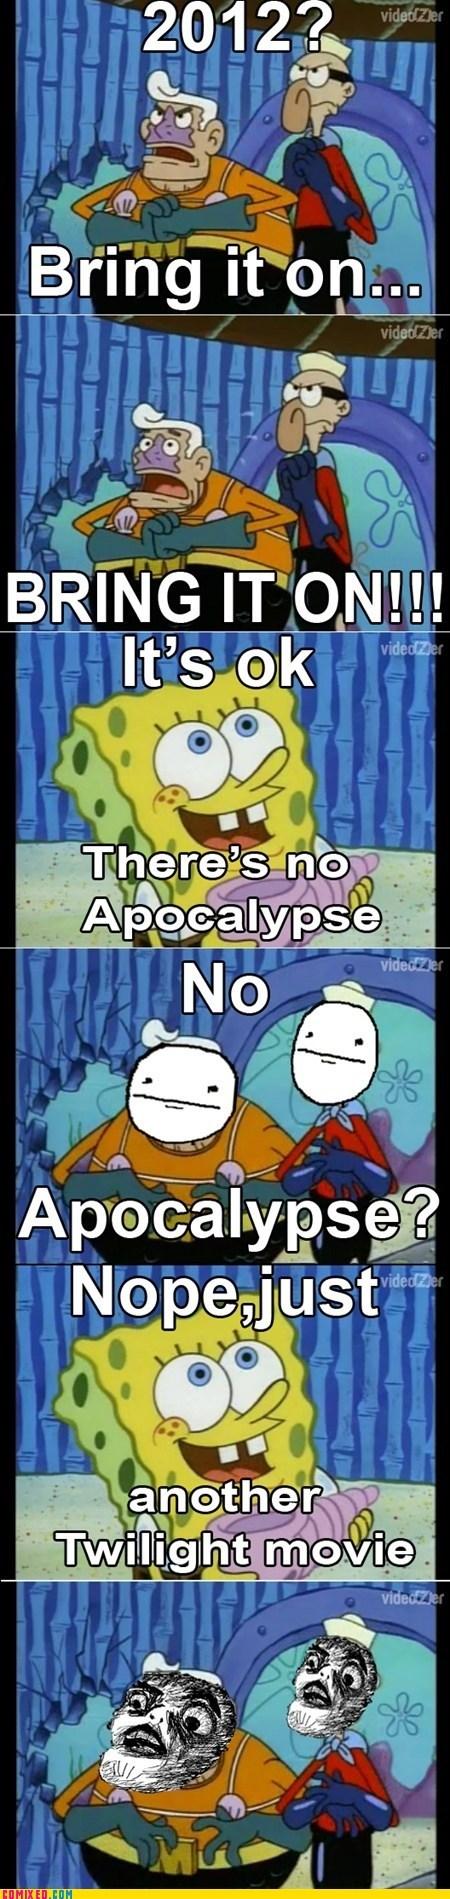 2012,new movies,SpongeBob SquarePants,the internets,twilight,world will end